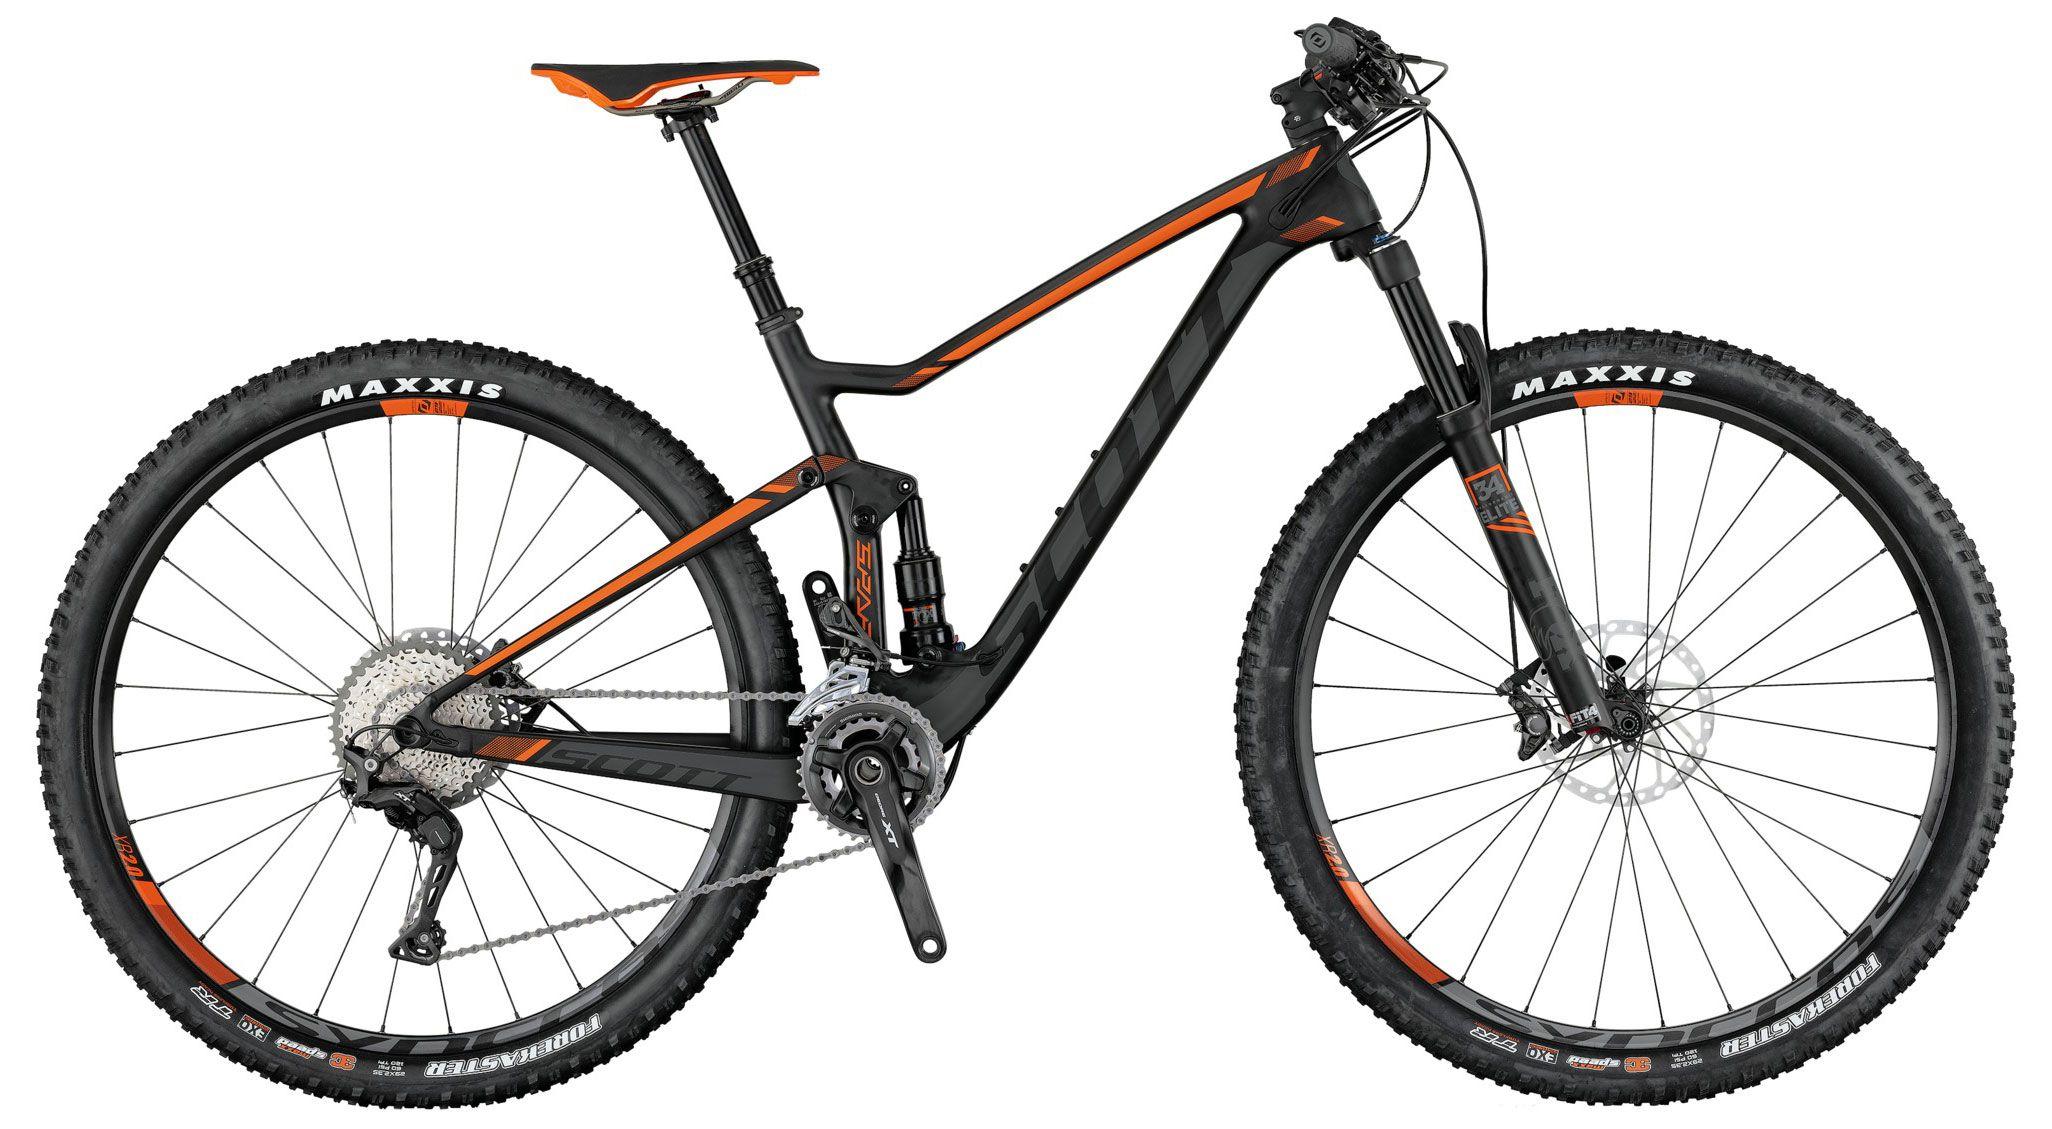 Велосипед Scott Spark 710 2017,  Двухподвесы  - артикул:275854